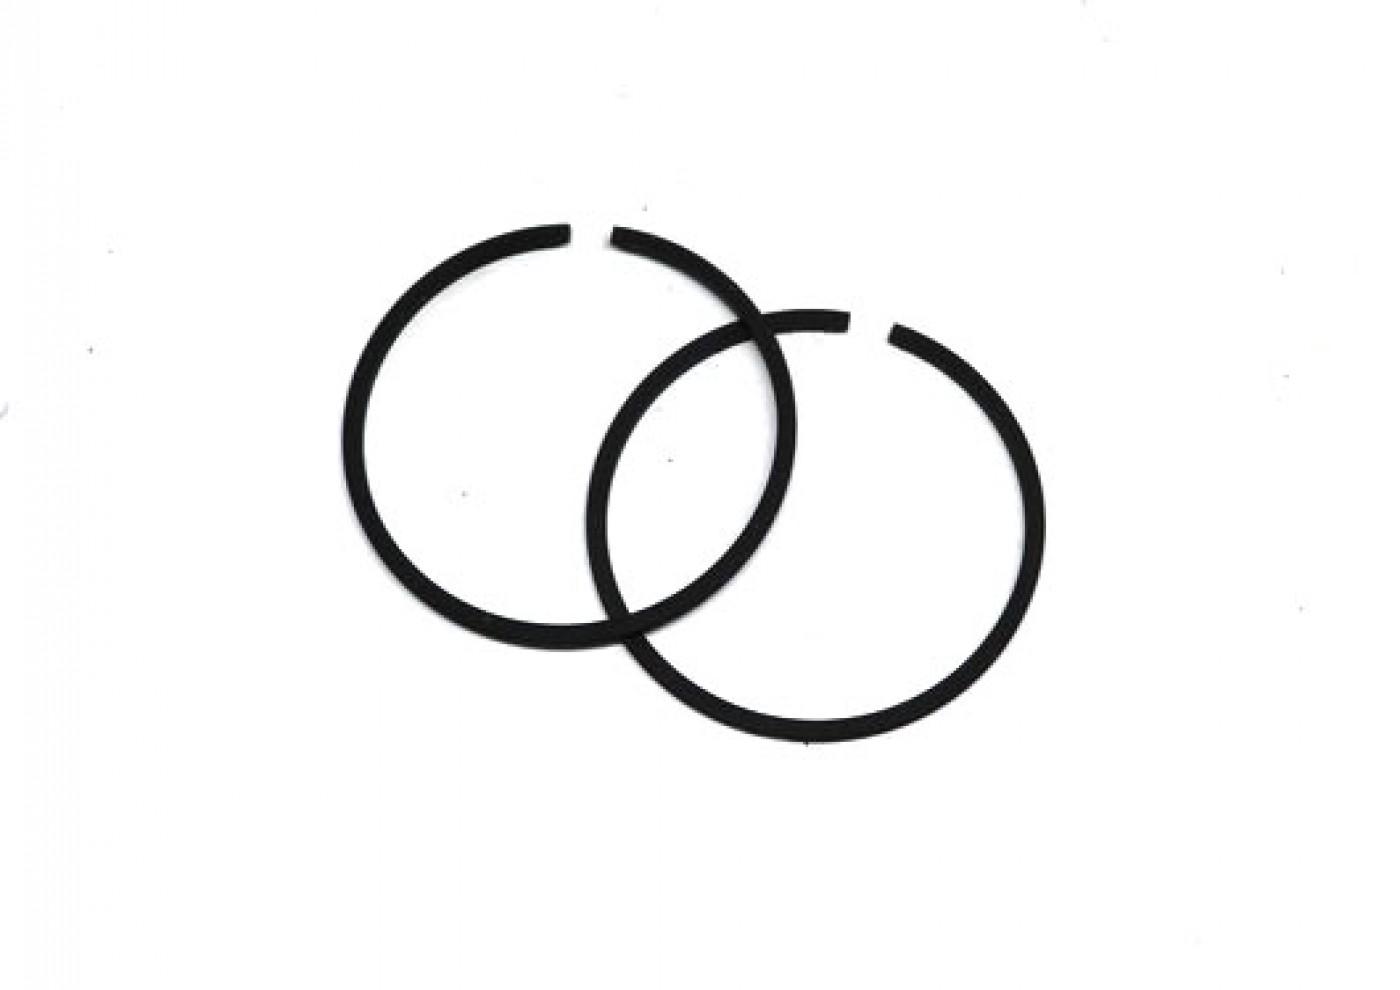 Sada kroužků Partner K1250